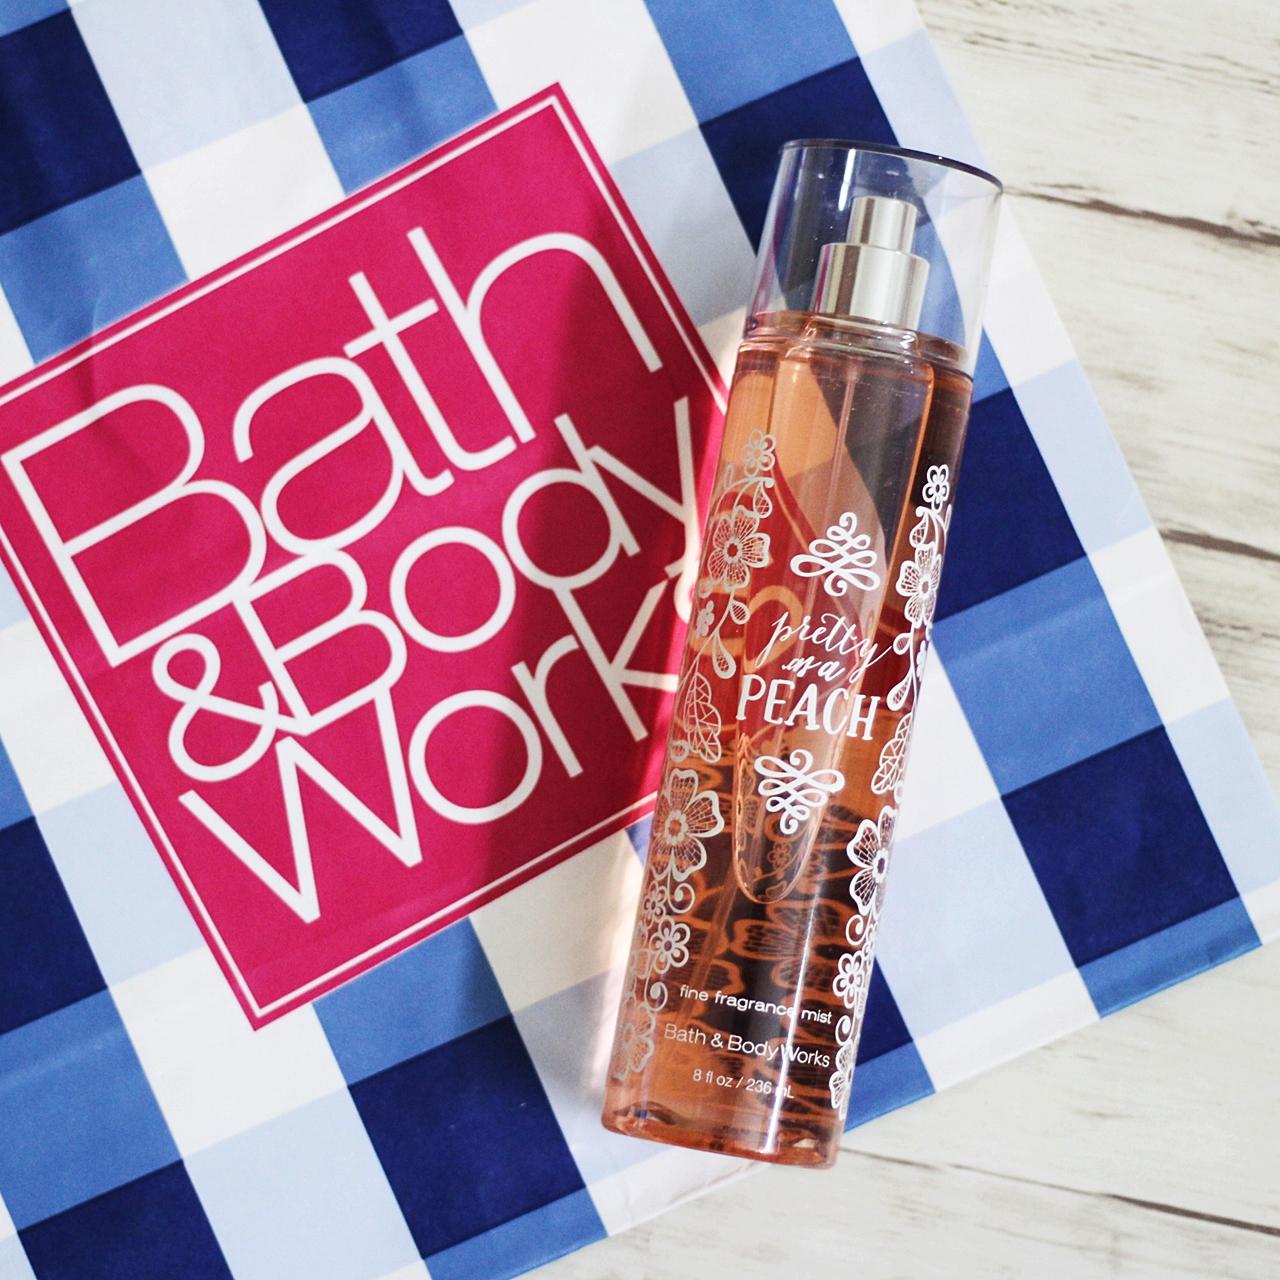 Bath & Body Pretty As A Peach Fragrance Mist